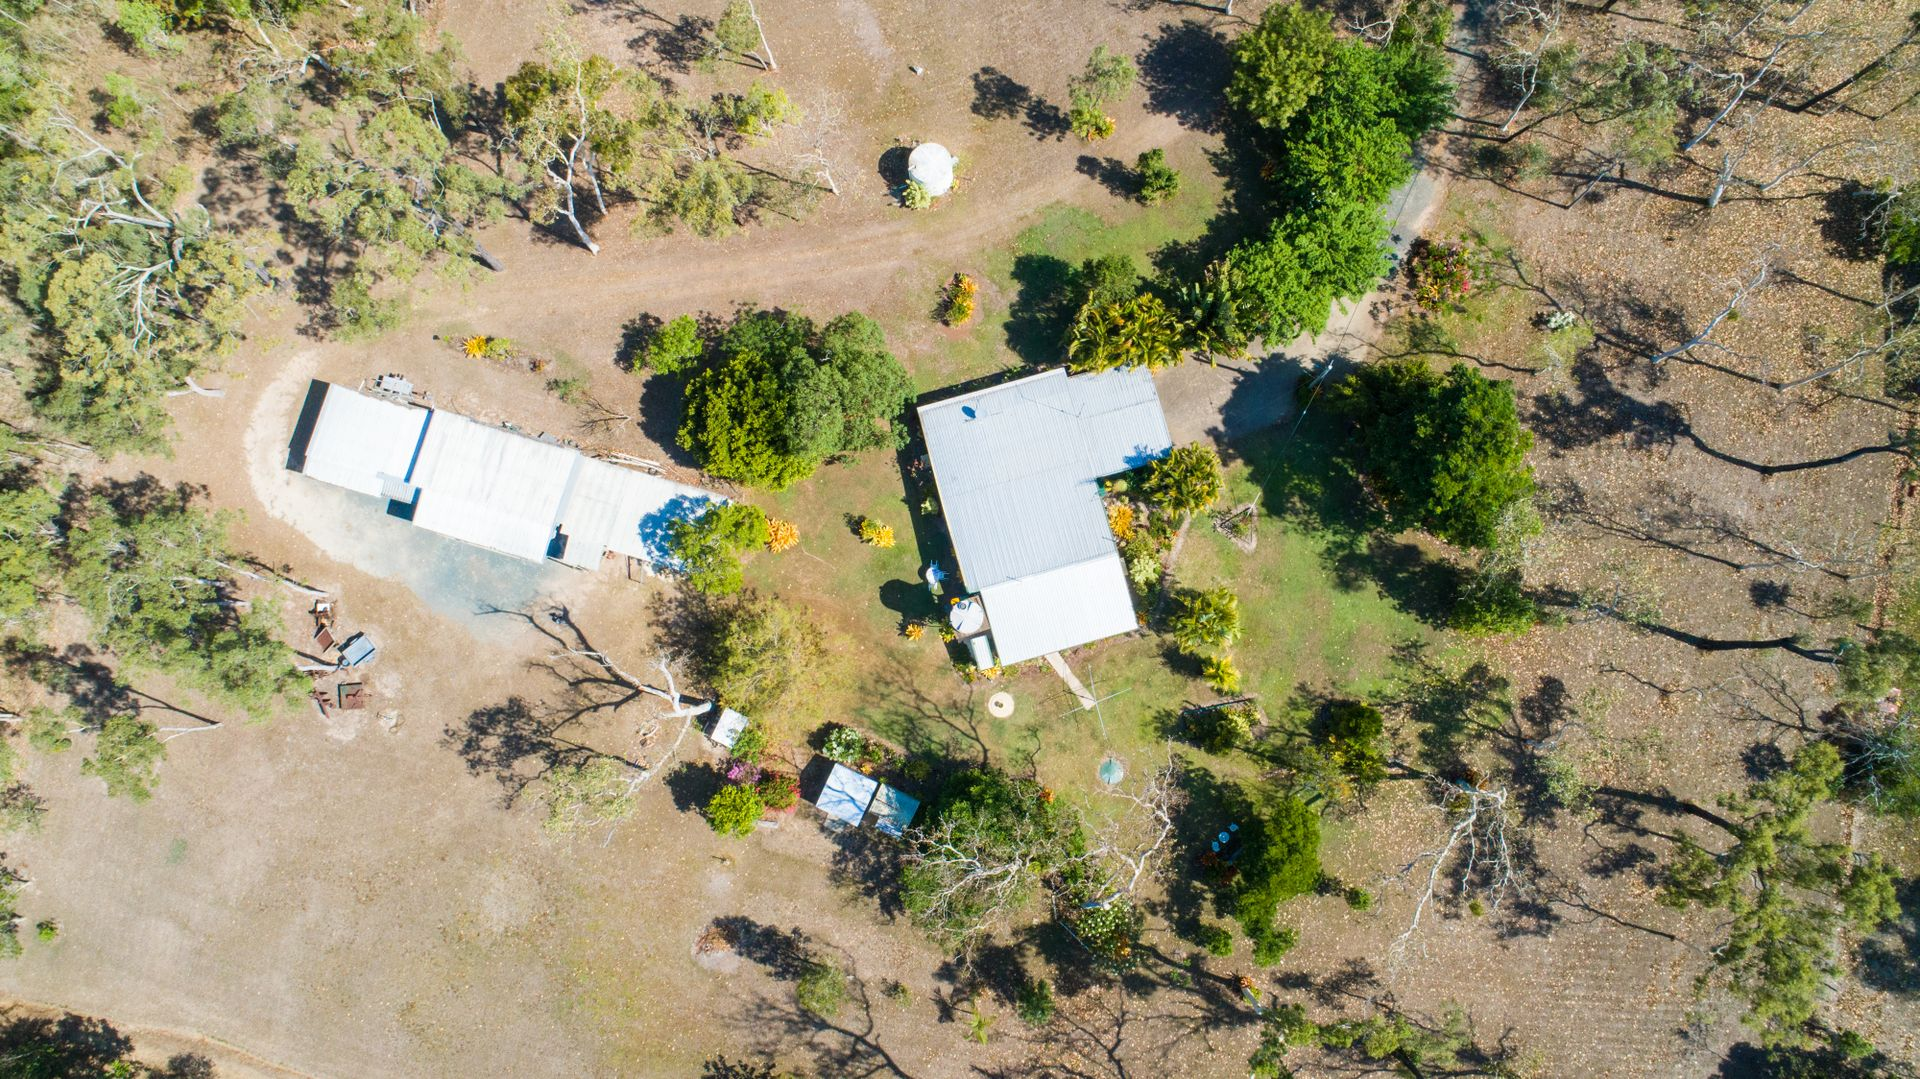 2268 CrystalBrook Road, Crystal Brook QLD 4800, Image 0